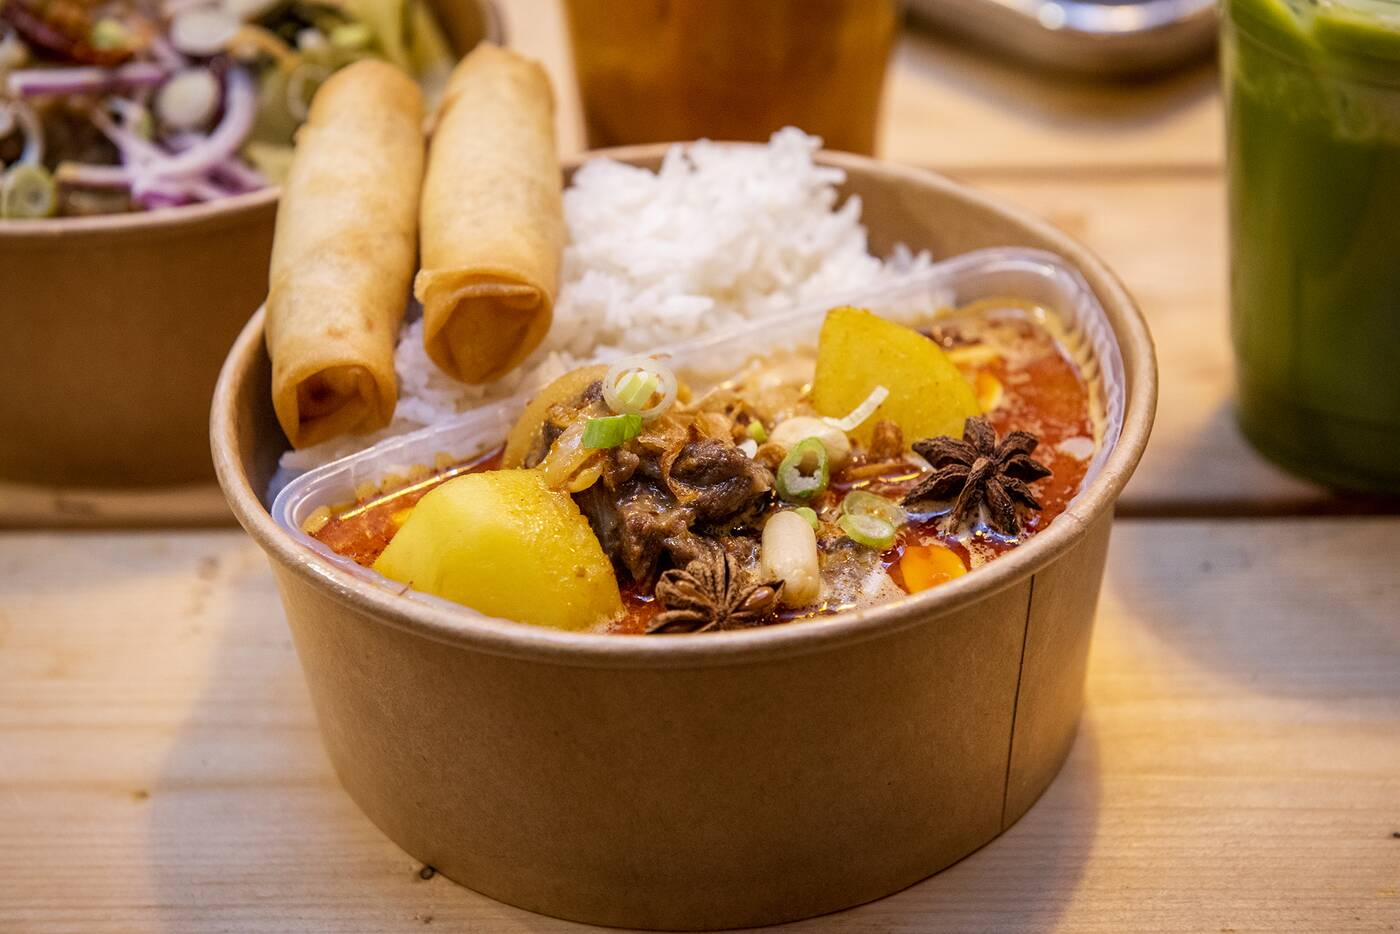 annex food hall toronto